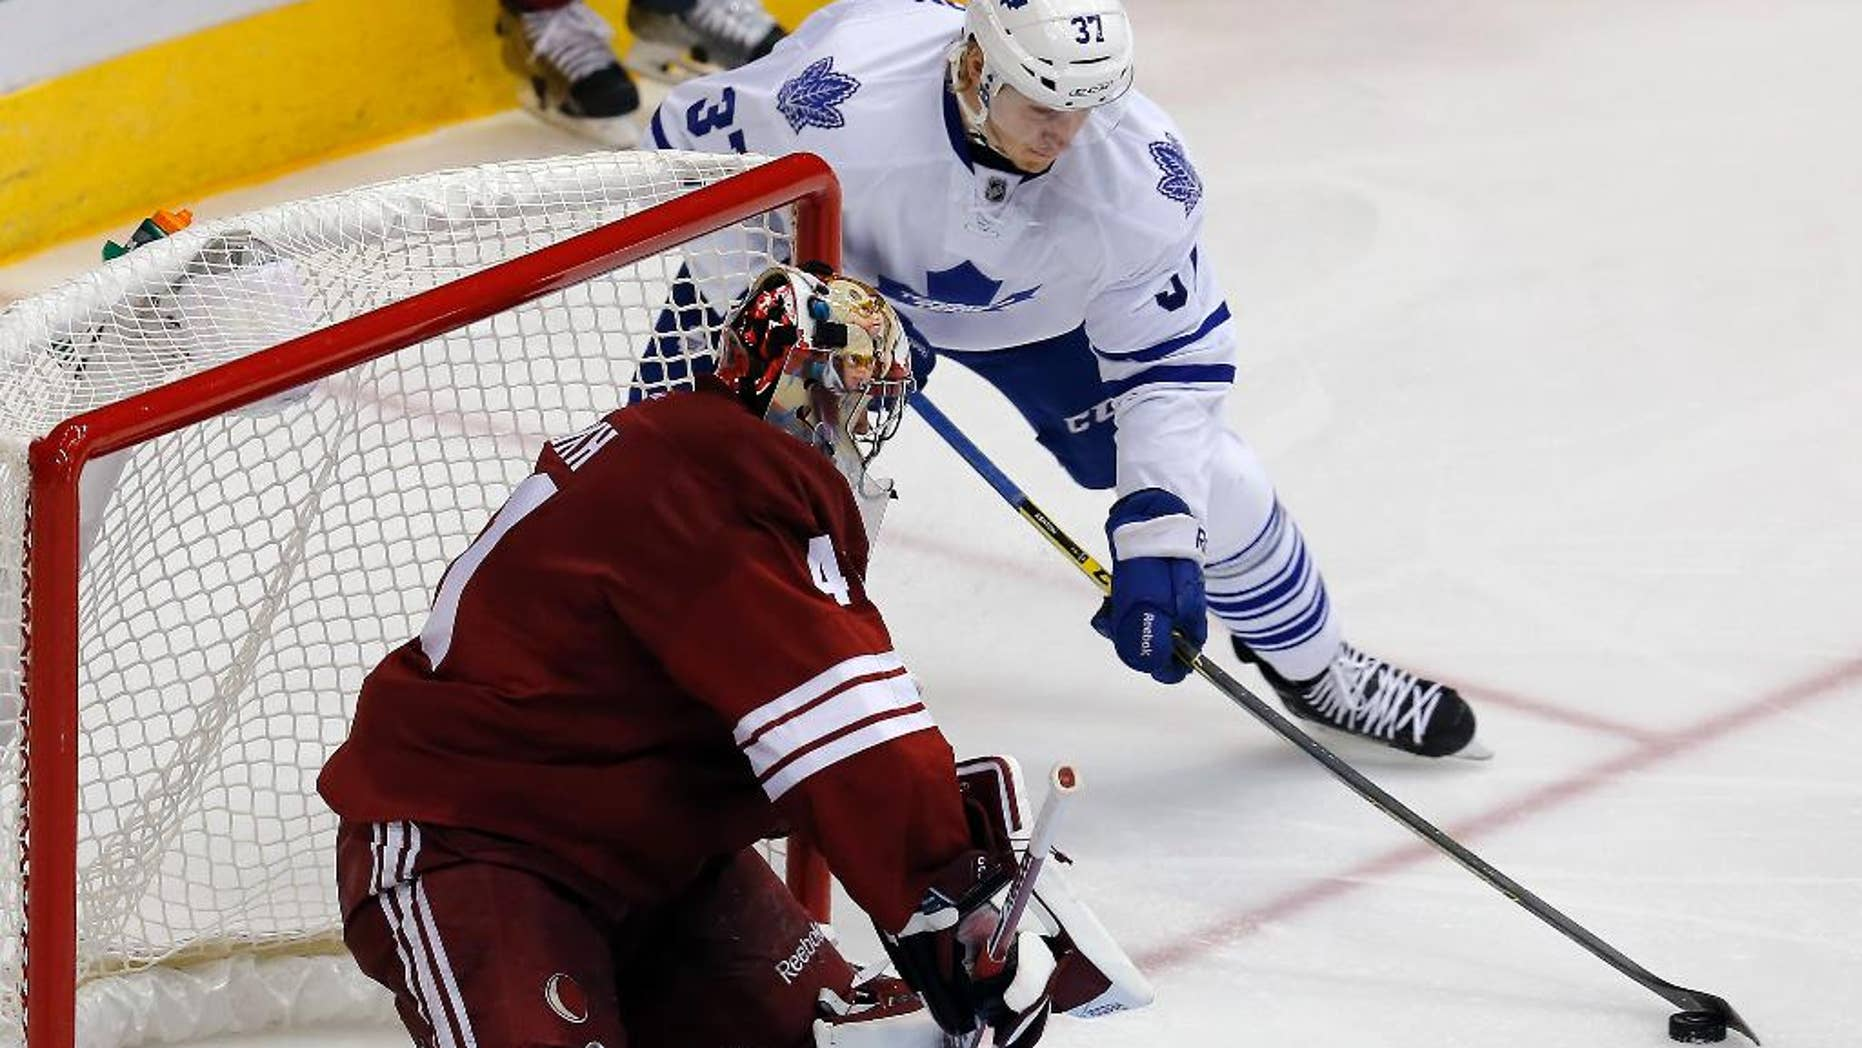 Toronto Maple Leafs right wing Carter Ashton (37) tries to score on Arizona Coyotes goalie Mike Smith during the third period during an NHL hockey game, Tuesday, Nov. 4, 2014, in Glendale, Ariz. Phoenix won 3-2. (AP Photo/Rick Scuteri)